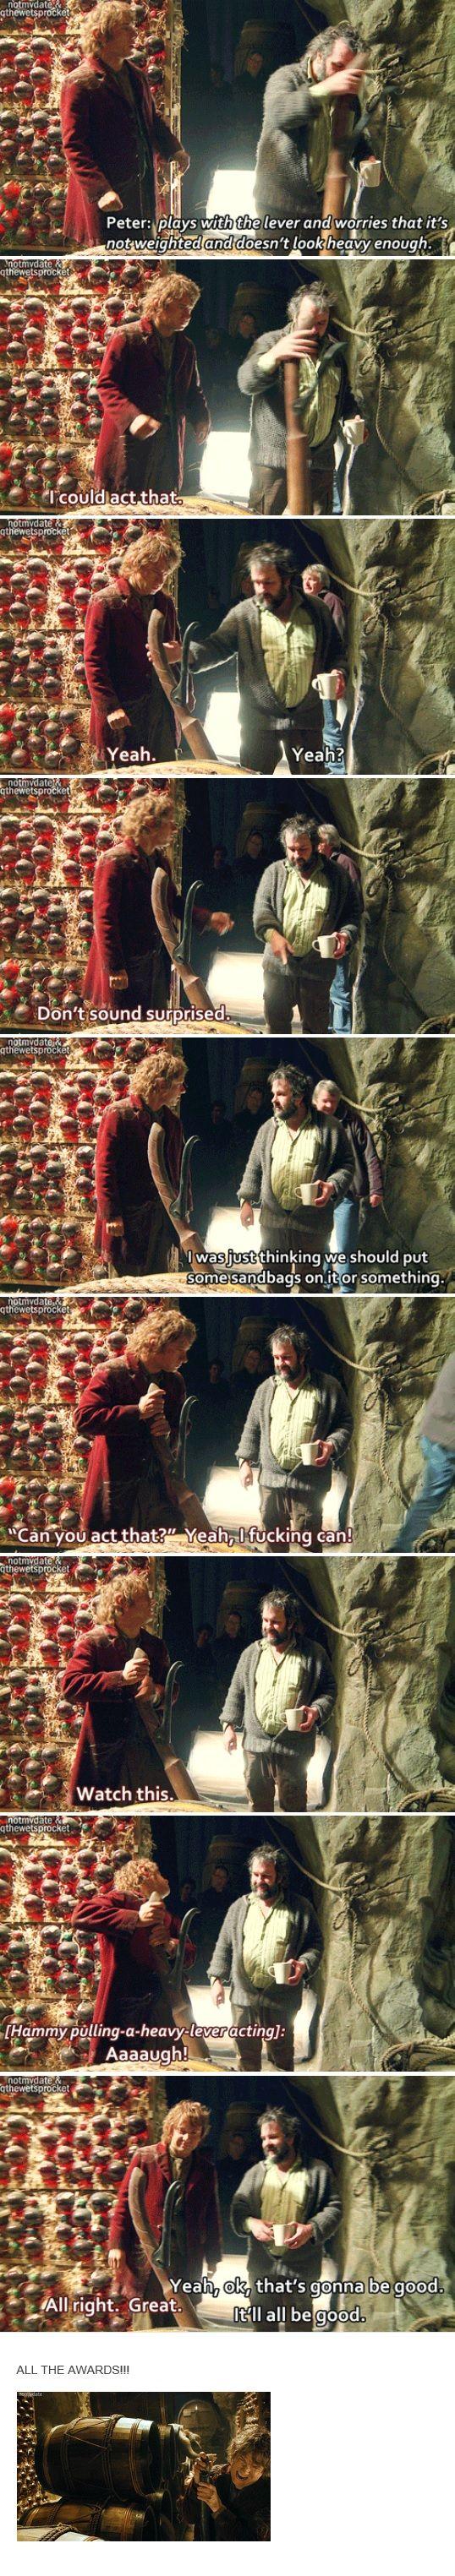 Martin Freeman's fantastic acting